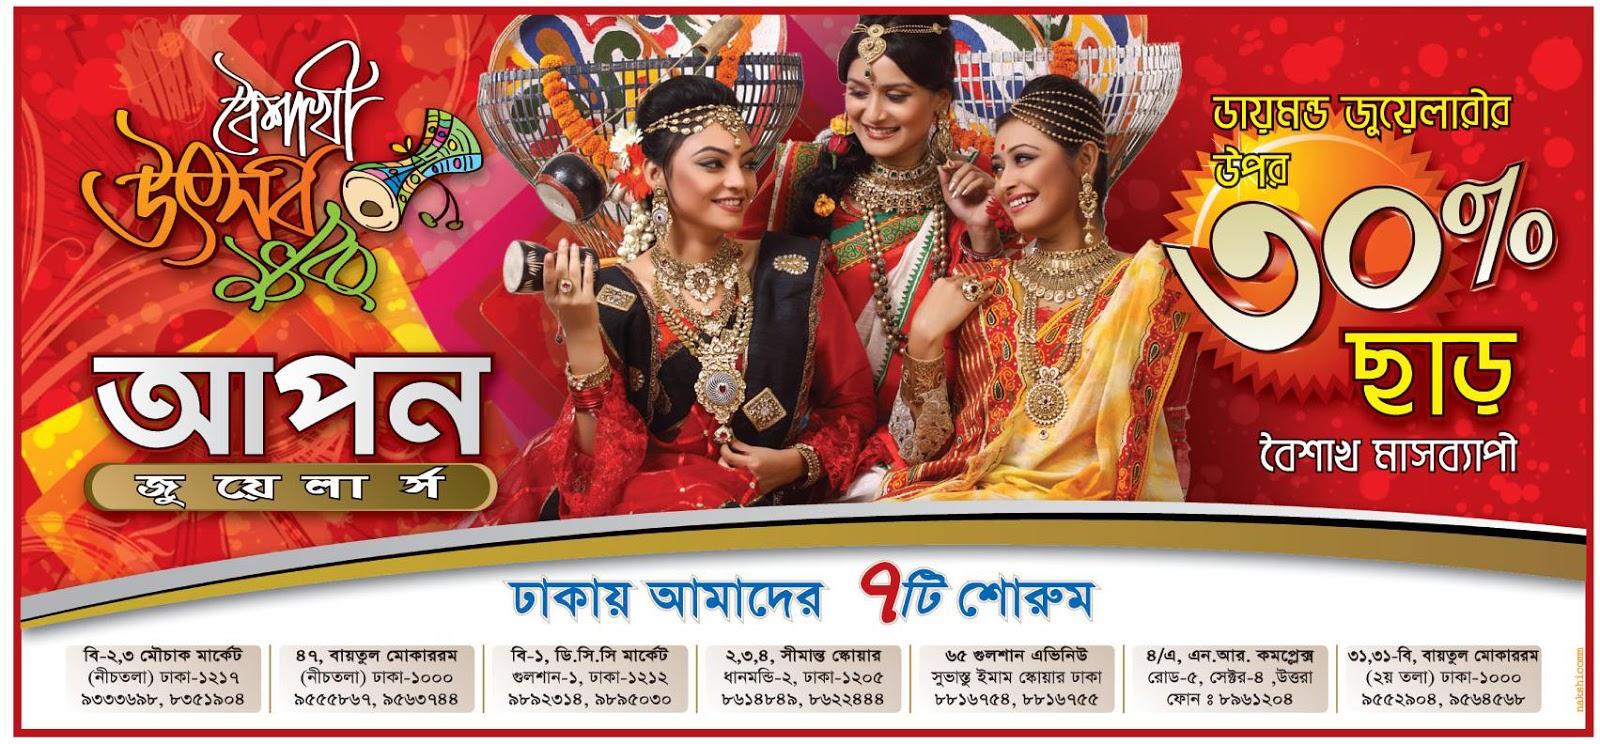 Advertising Archive Bangladesh: Apan Jewelers